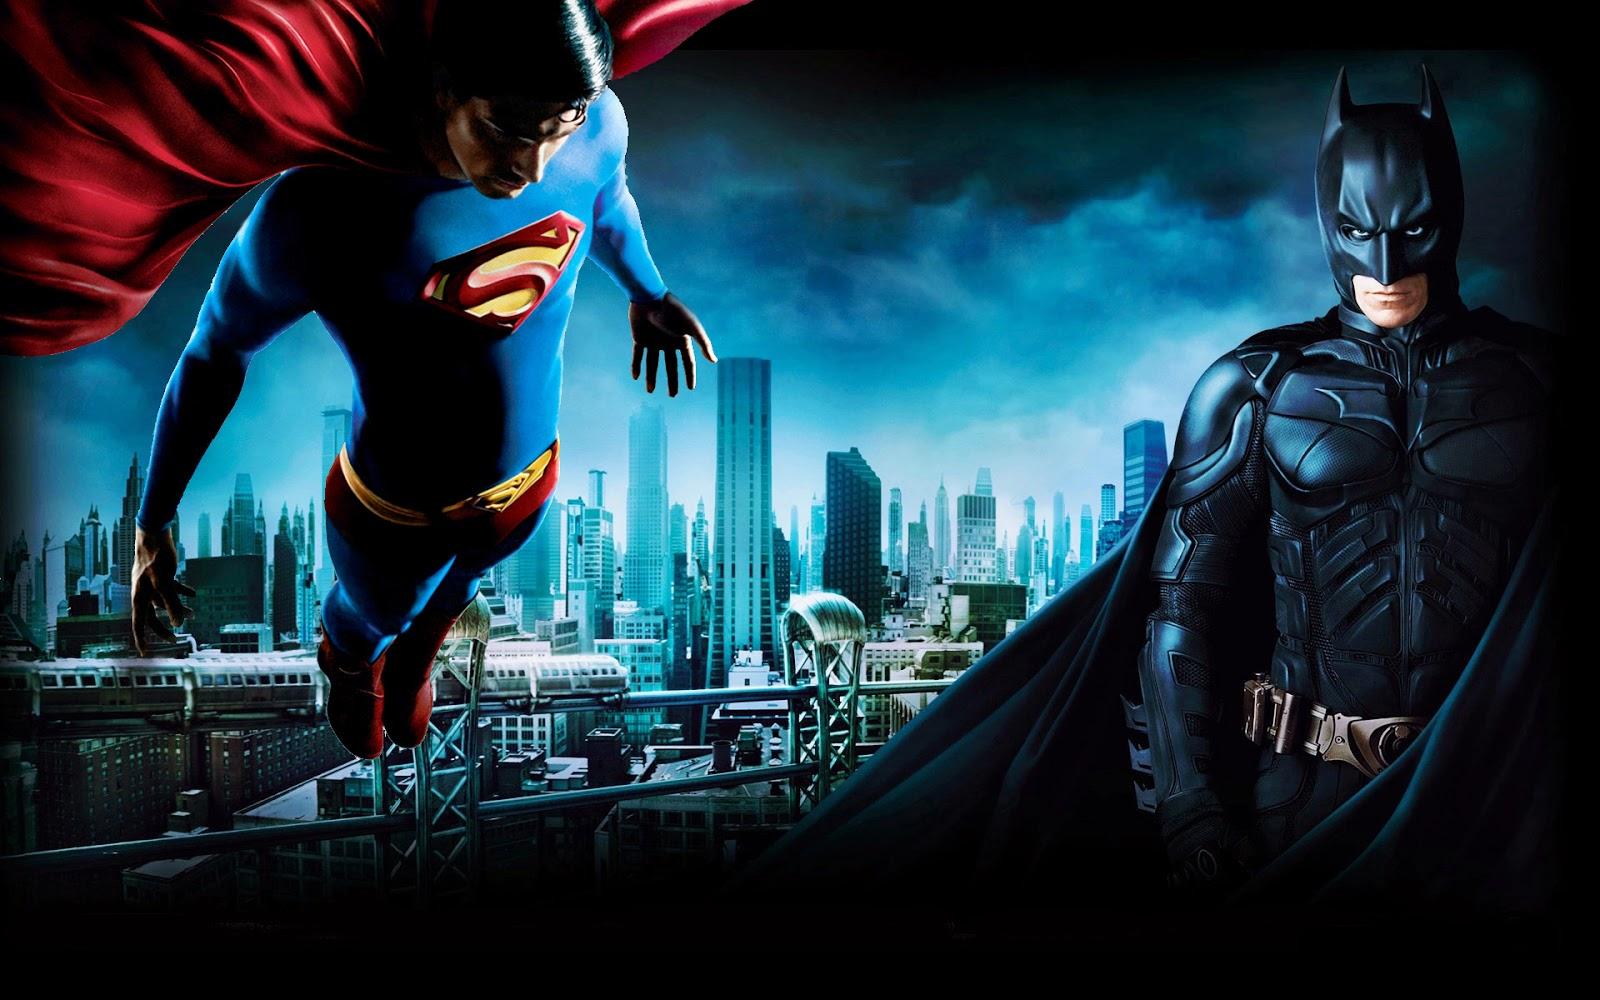 wallpaper mansion: batman vs. superman hd wallpapers